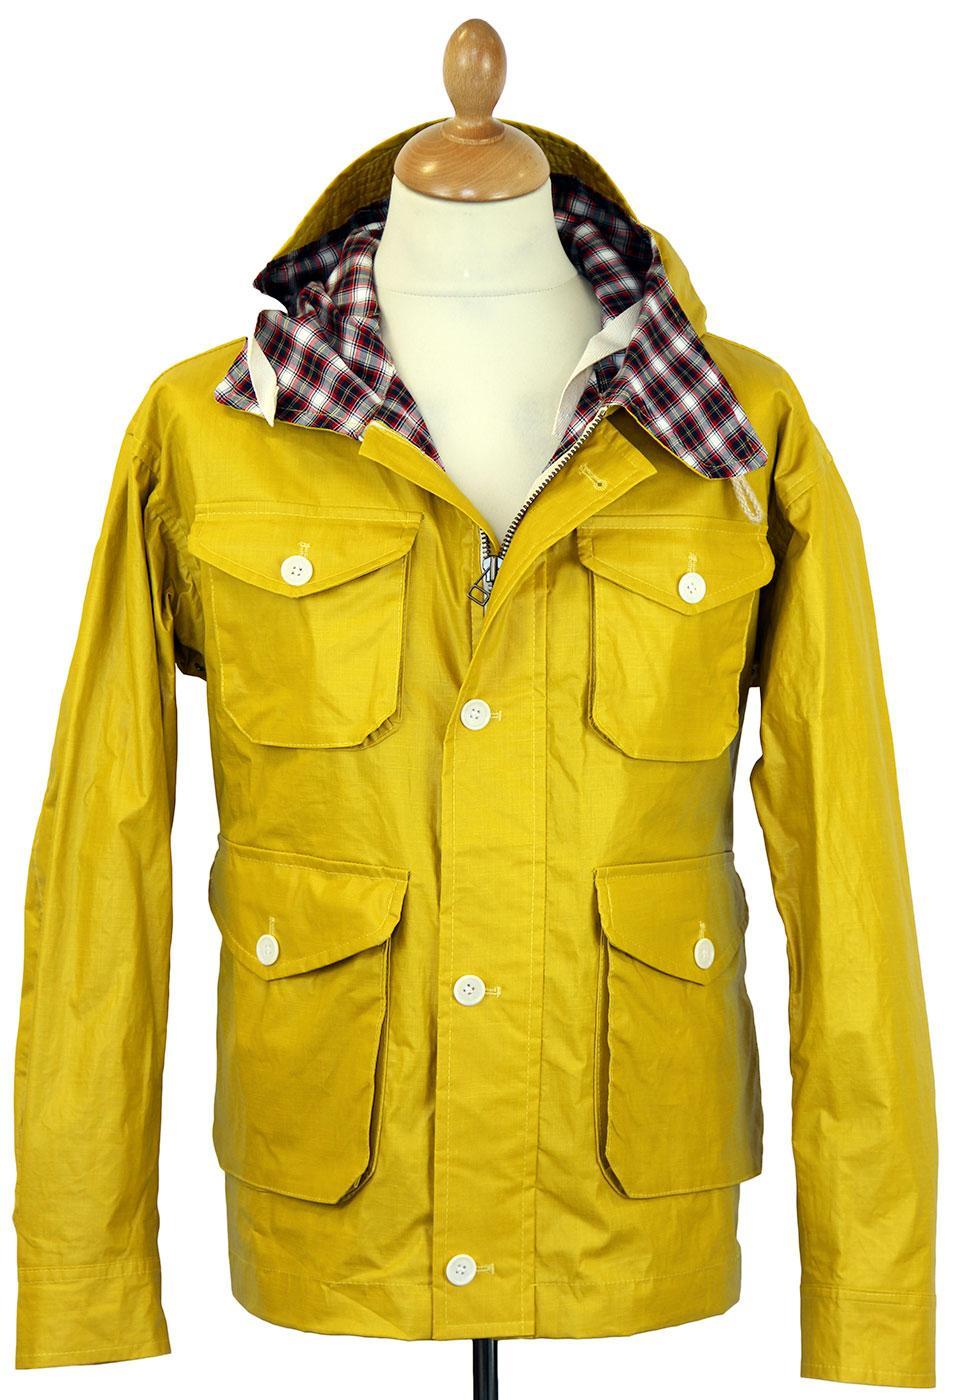 GLOVERALL 3535 Made in England Windbreaker Jacket